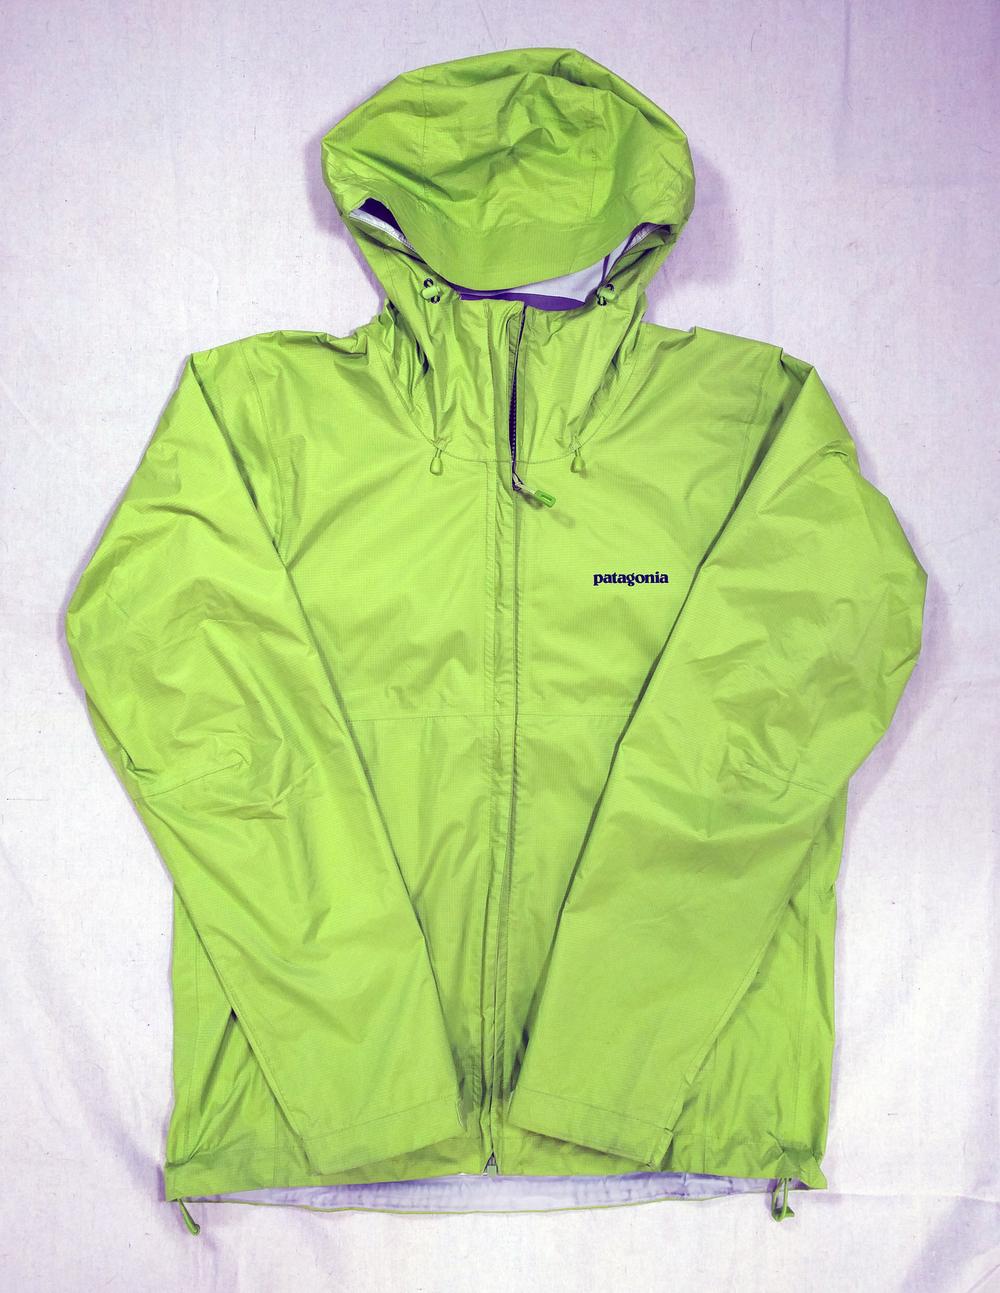 Nate Patagonia Jacket.jpg